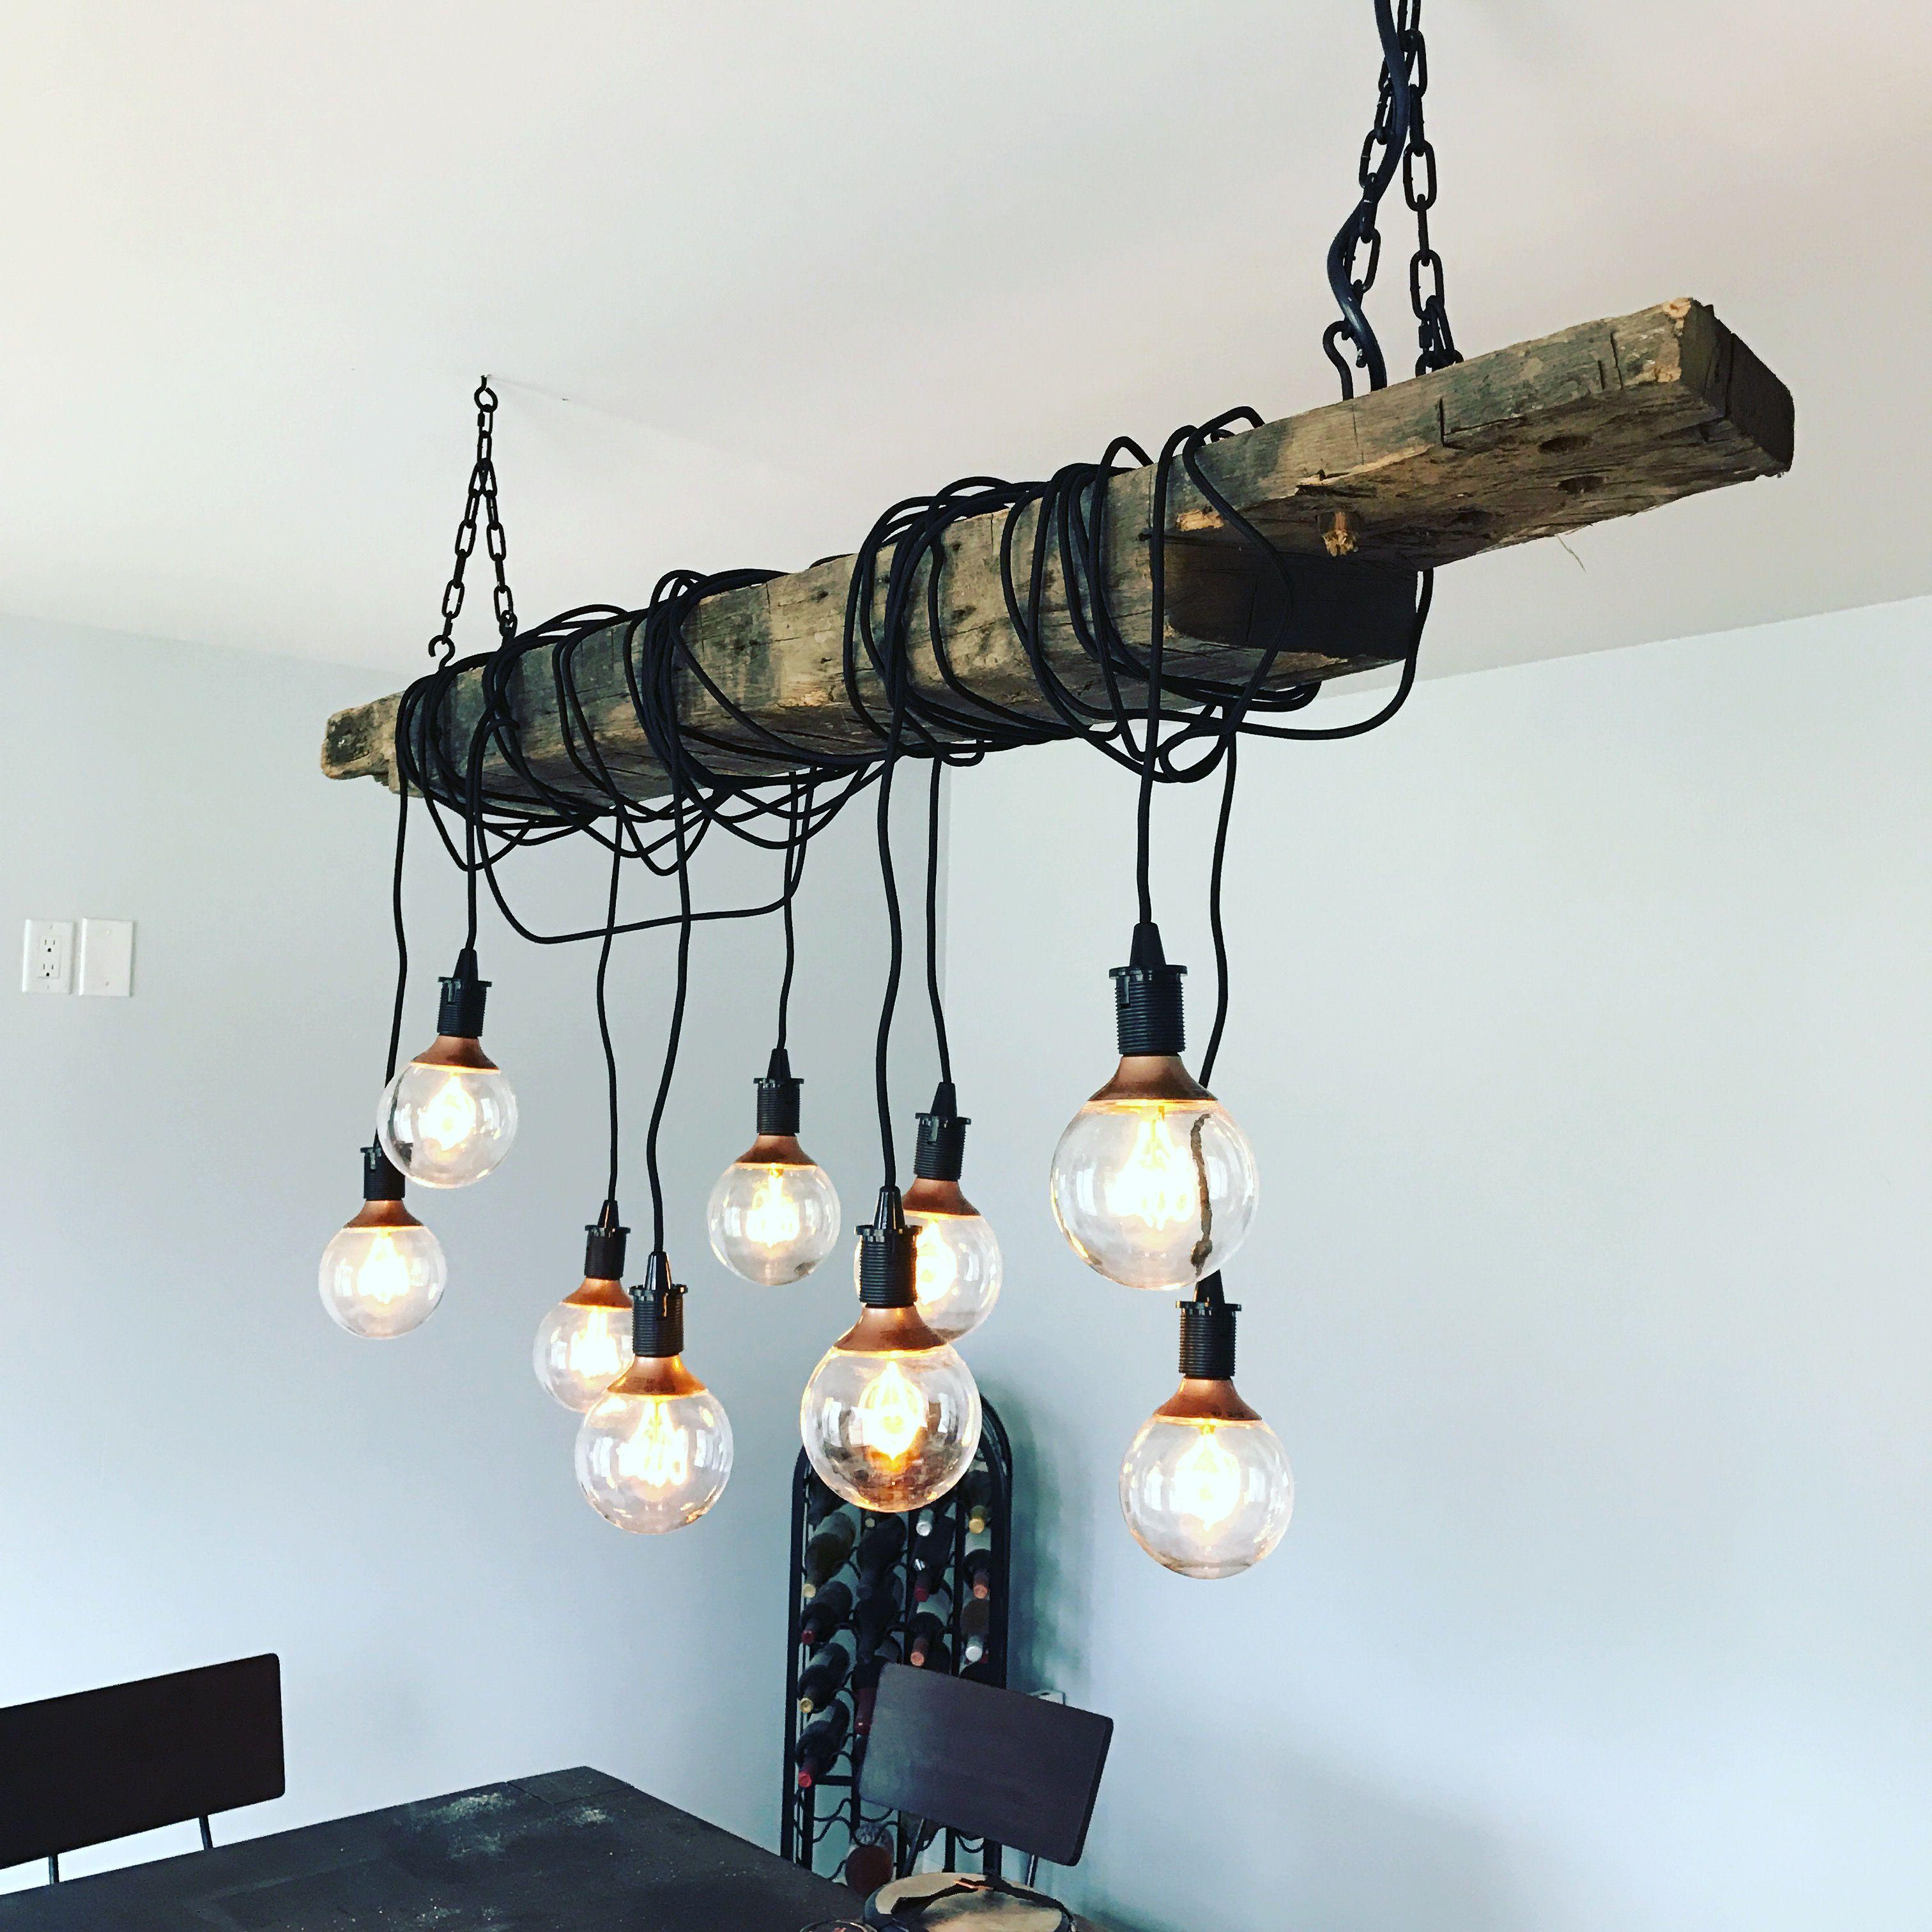 Barn wood beam chandelier Great diy weekend project